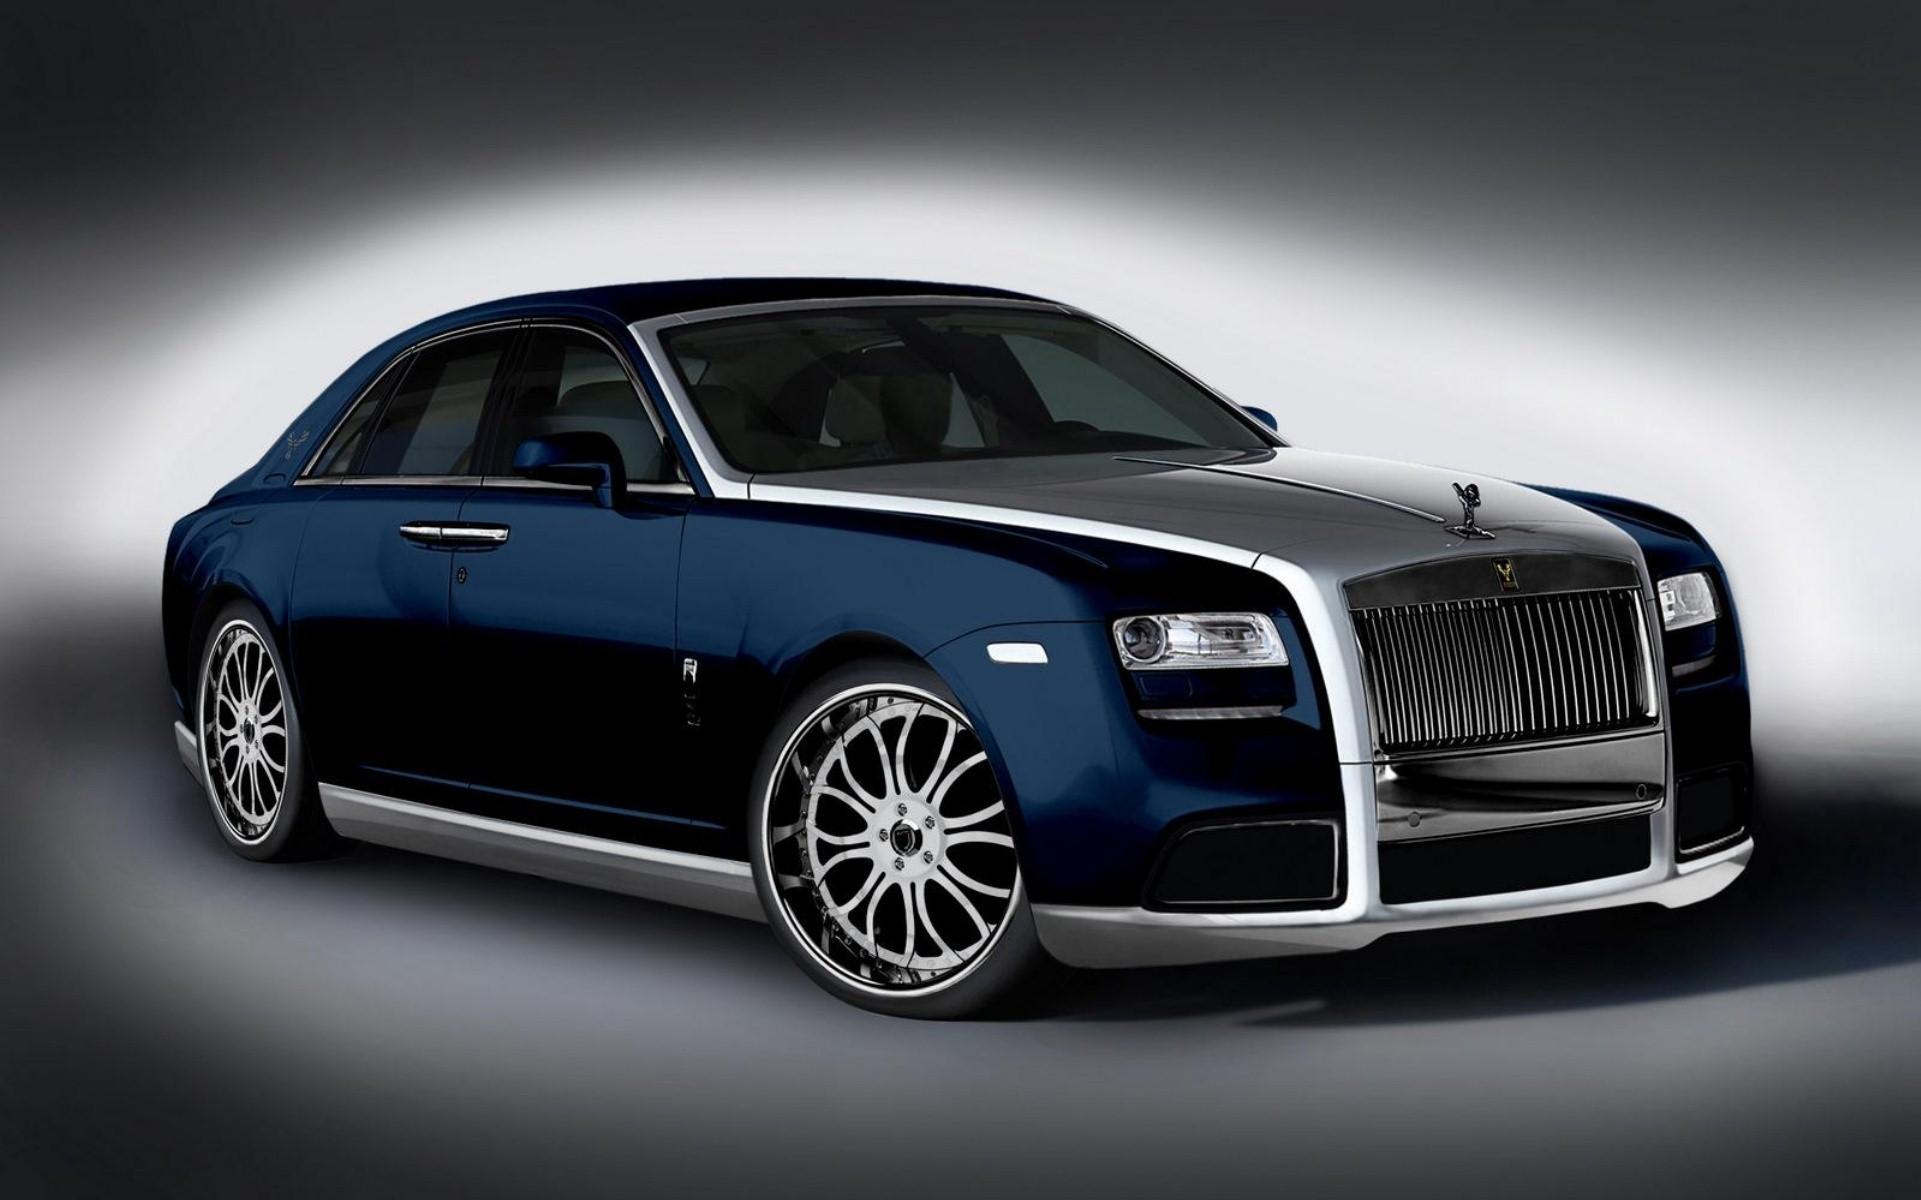 180 <b>Rolls Royce</b> HD <b>Wallpapers</b> | <b>Backgrounds</b> - <b>Wallpaper</b> Abyss